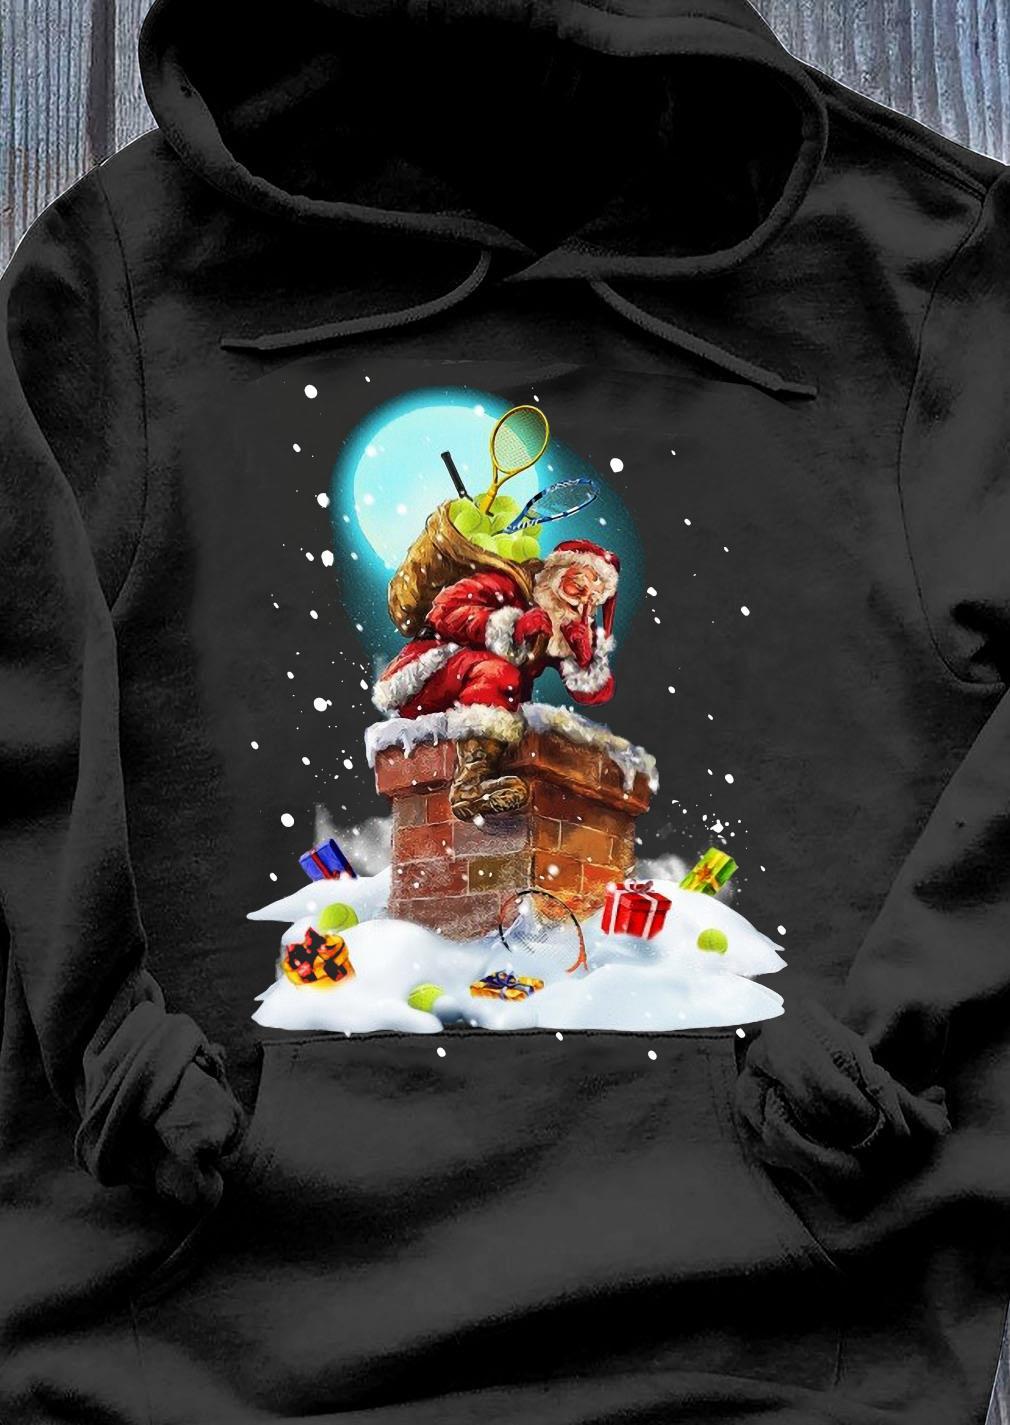 Santa Claus With Tennis Climbs The Chimney Crewneck Sweats Hoodie